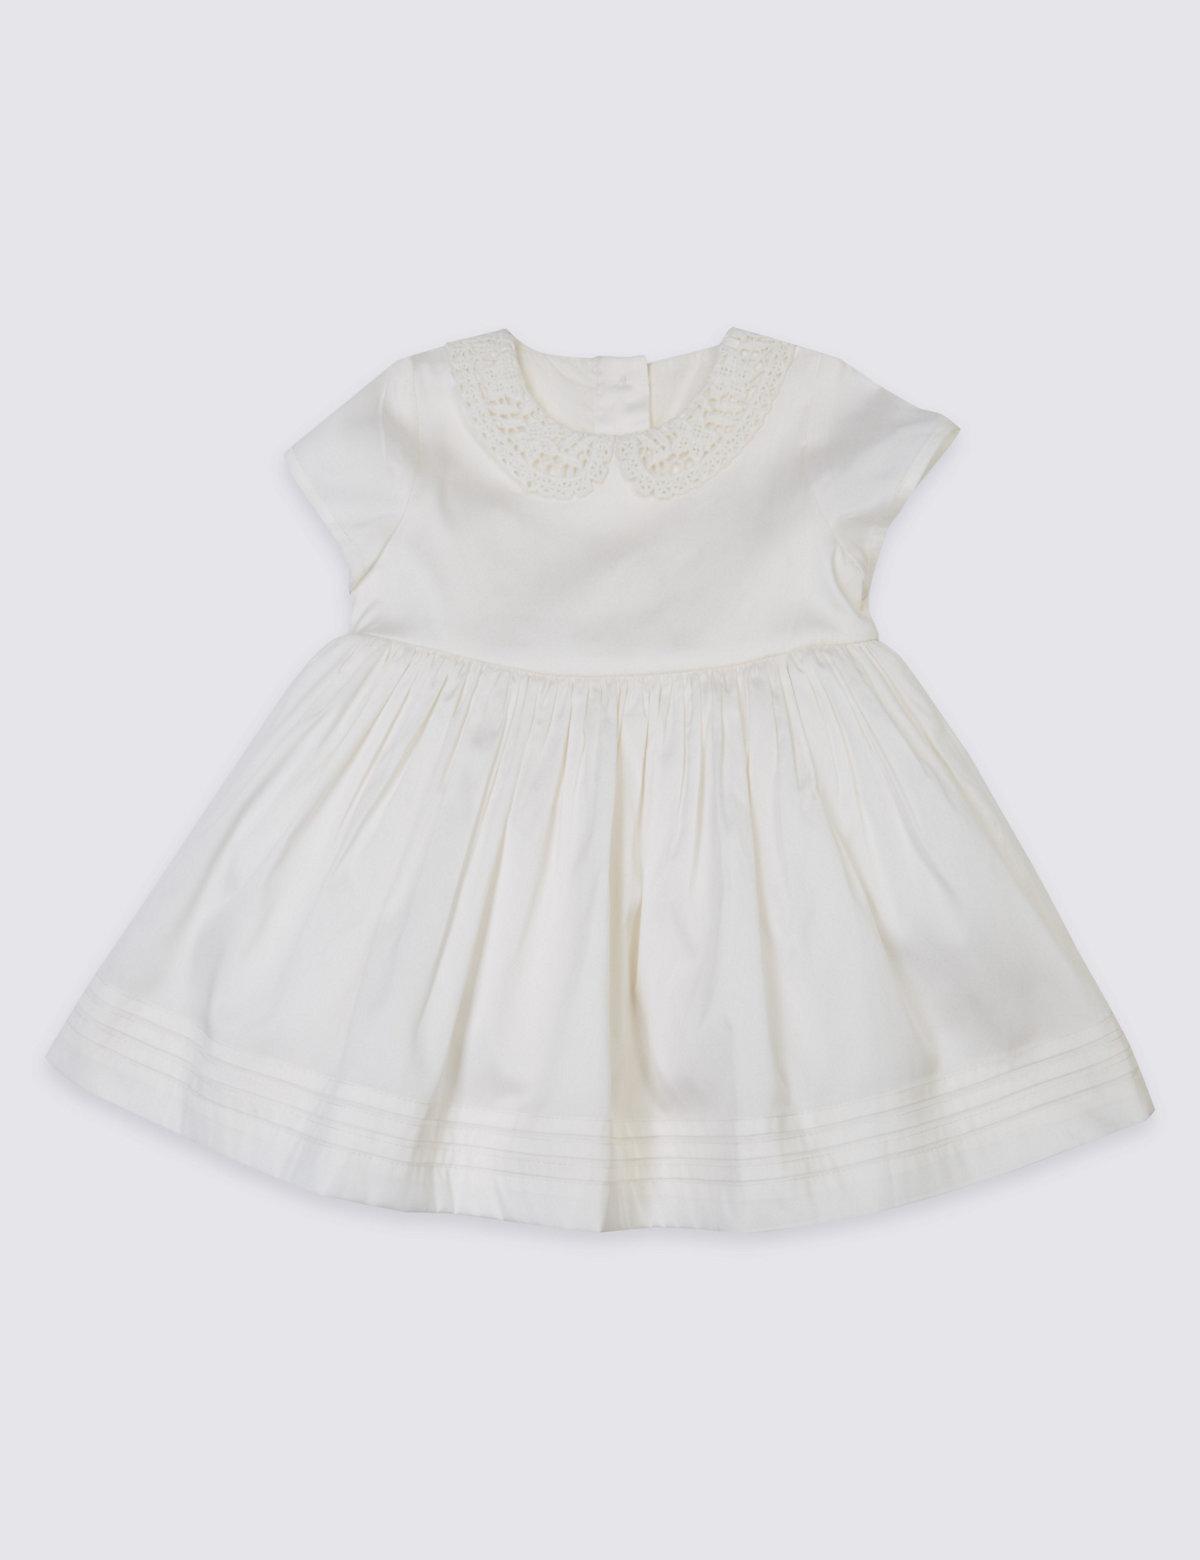 Autograph Peter Pan Collar Christening Baby Dress